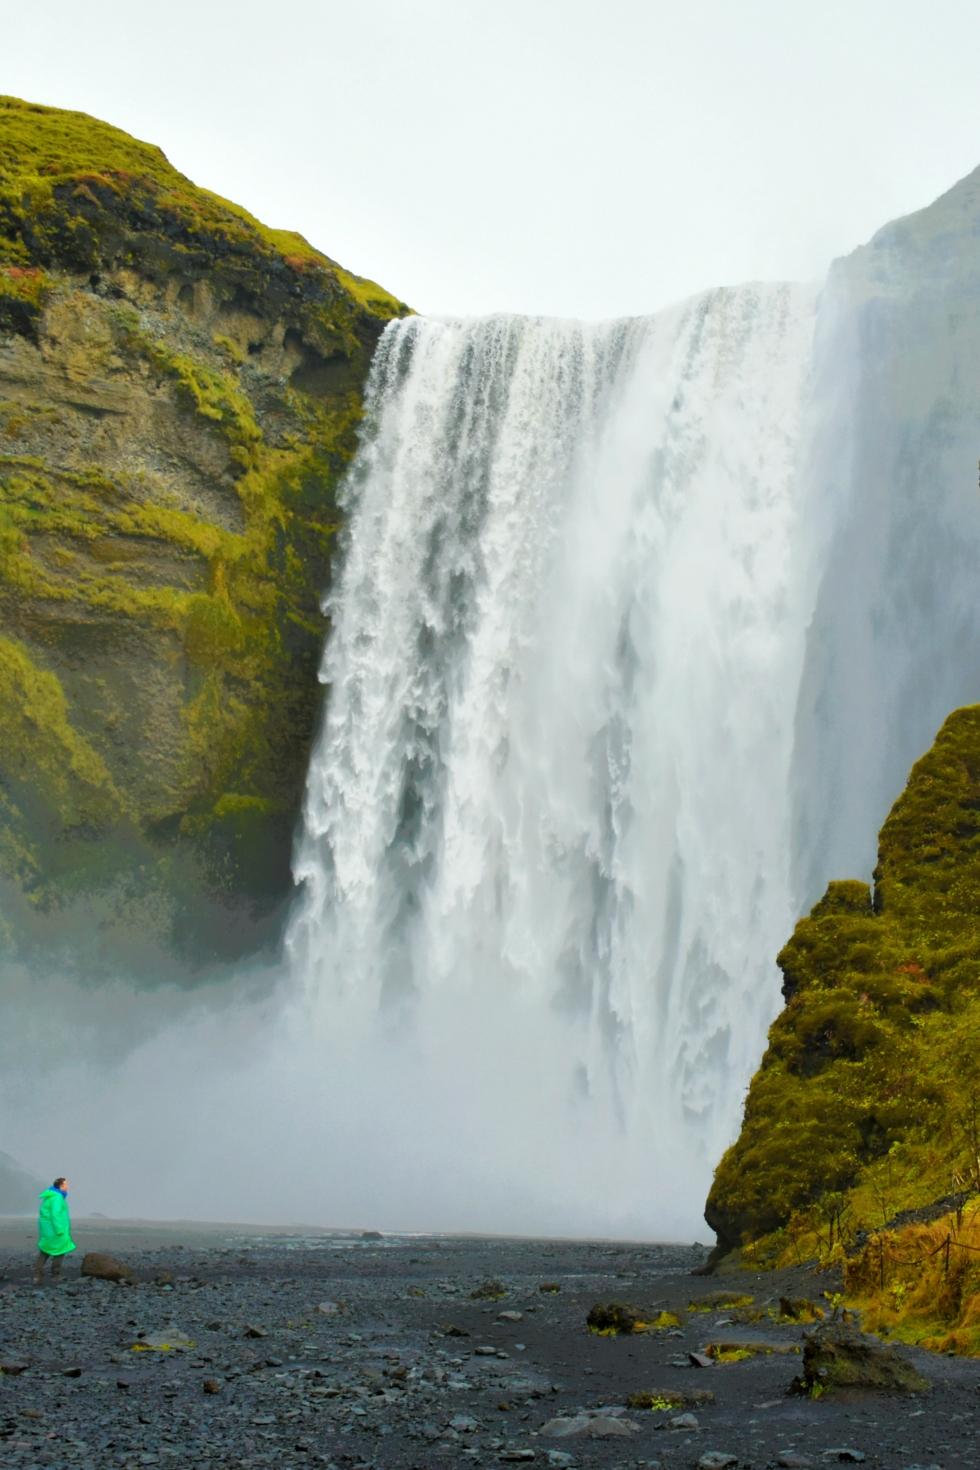 Skogafoss waterfall in Iceland, by Desiree Anstey